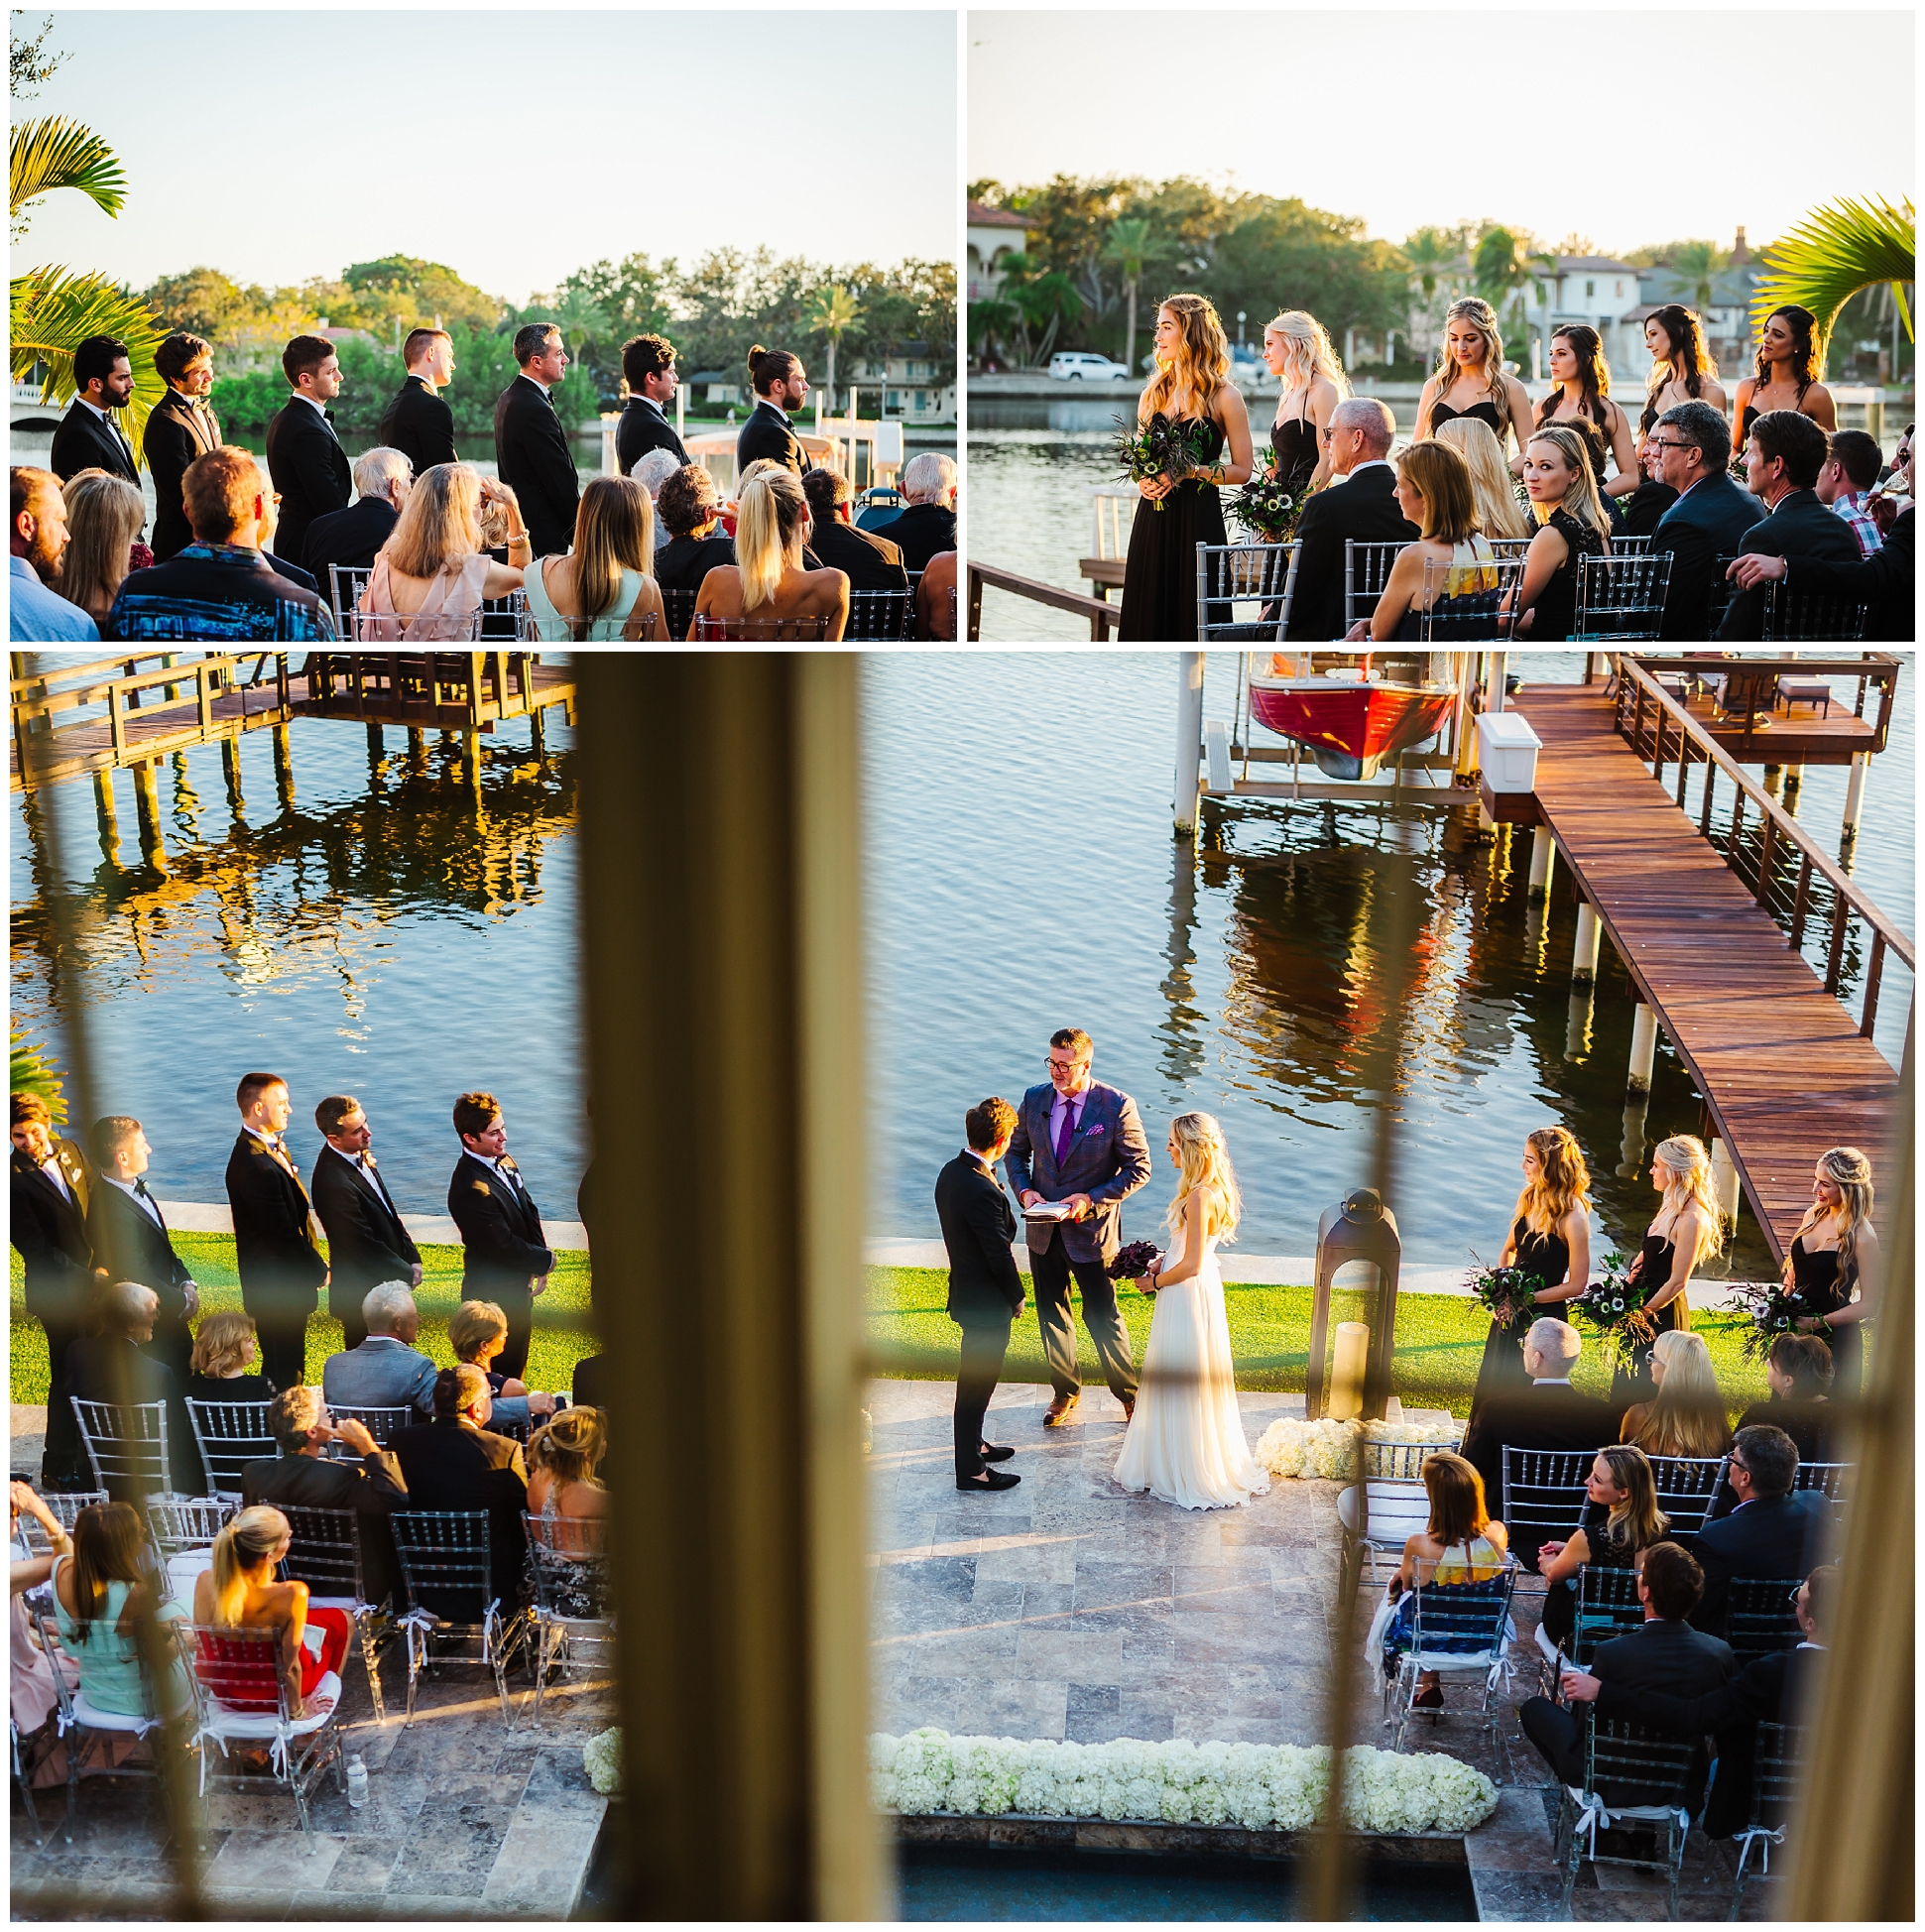 st-pete-wedding-photographer-backyard-luxury-snell-isle-vinoy_0038.jpg